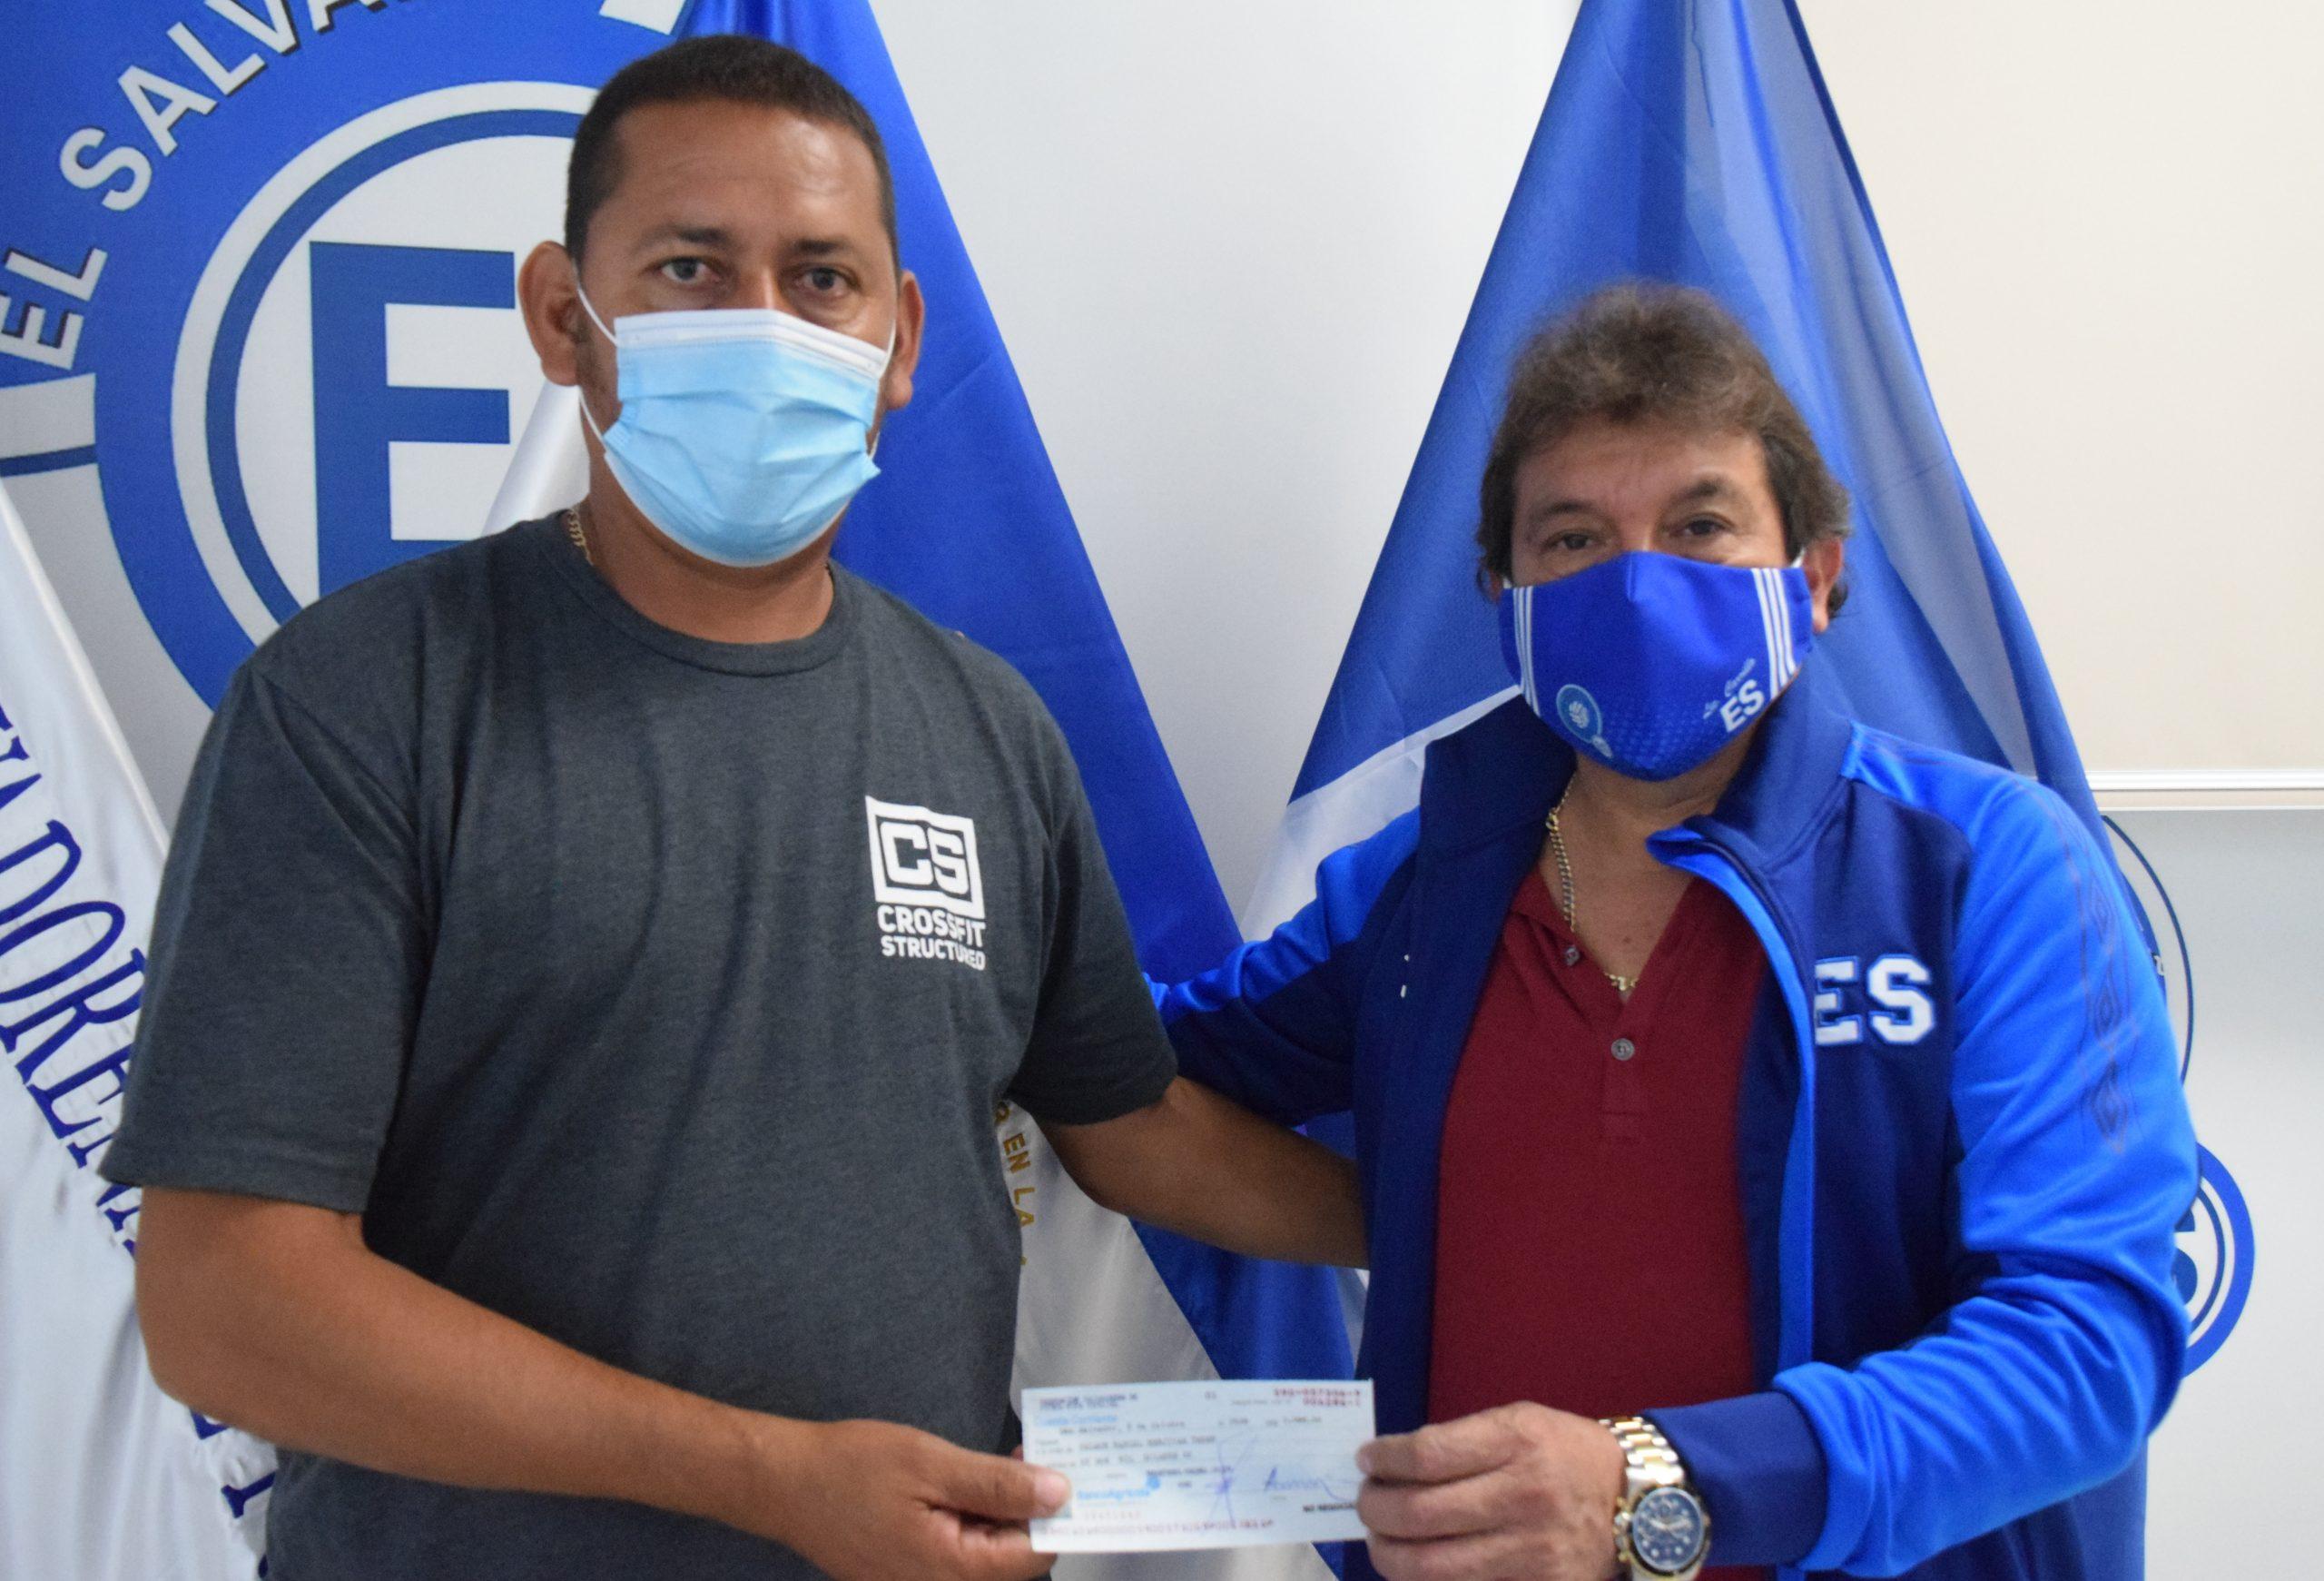 Señor Nelson Menjívar del Club Deportivo Huracán de Atiquizaya, Ahuachapán